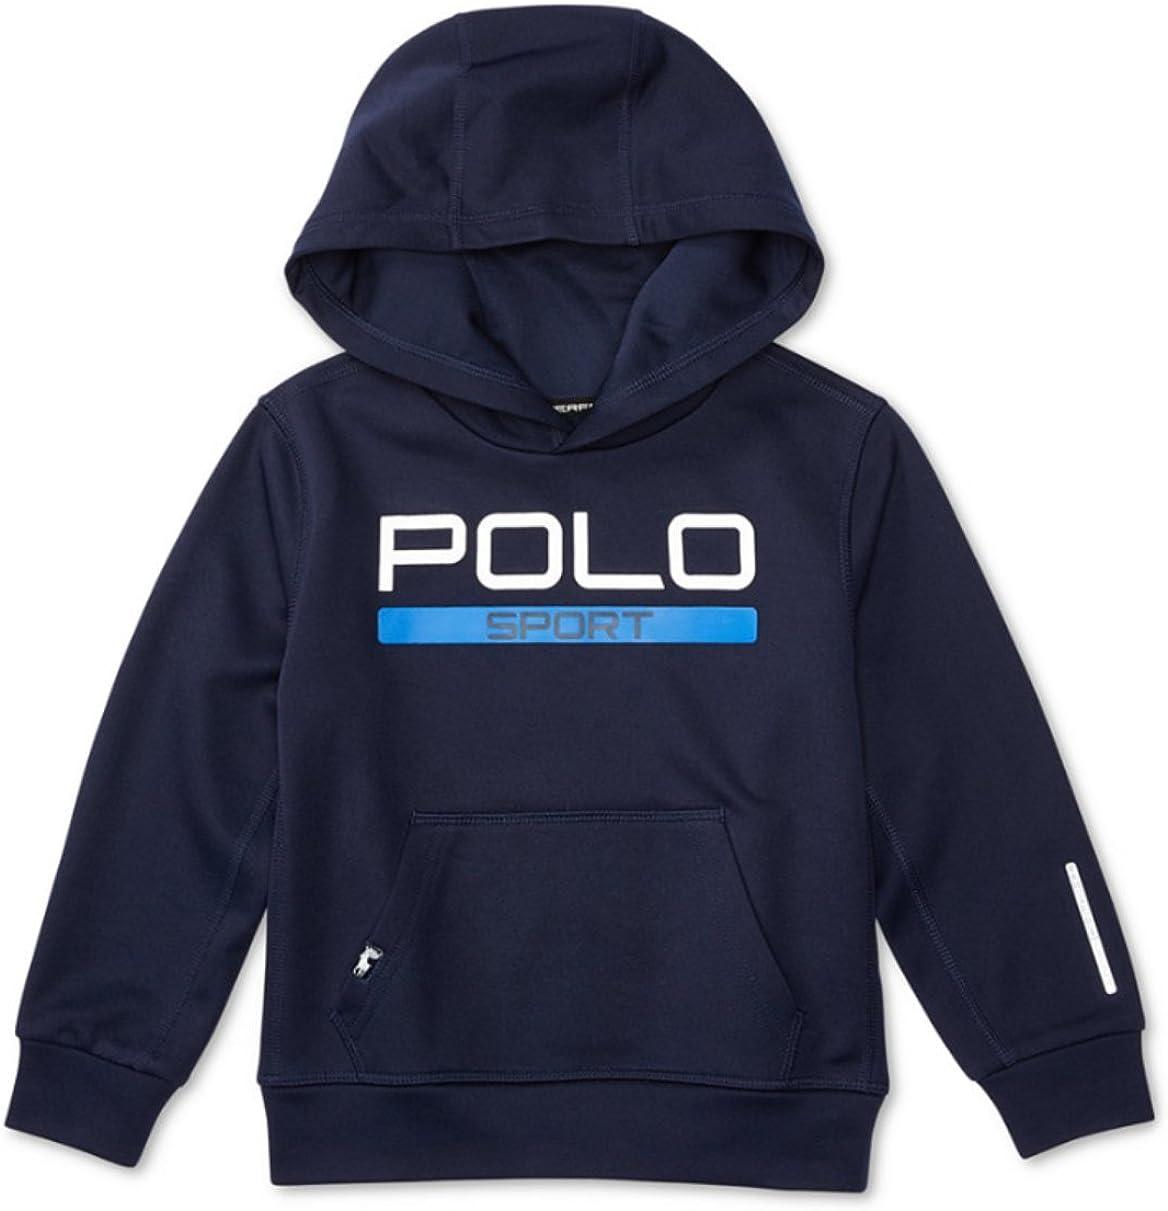 Ralph Lauren Polo Sport Boys Tech Fleece Pullover Hoodie (2/2T) French Navy